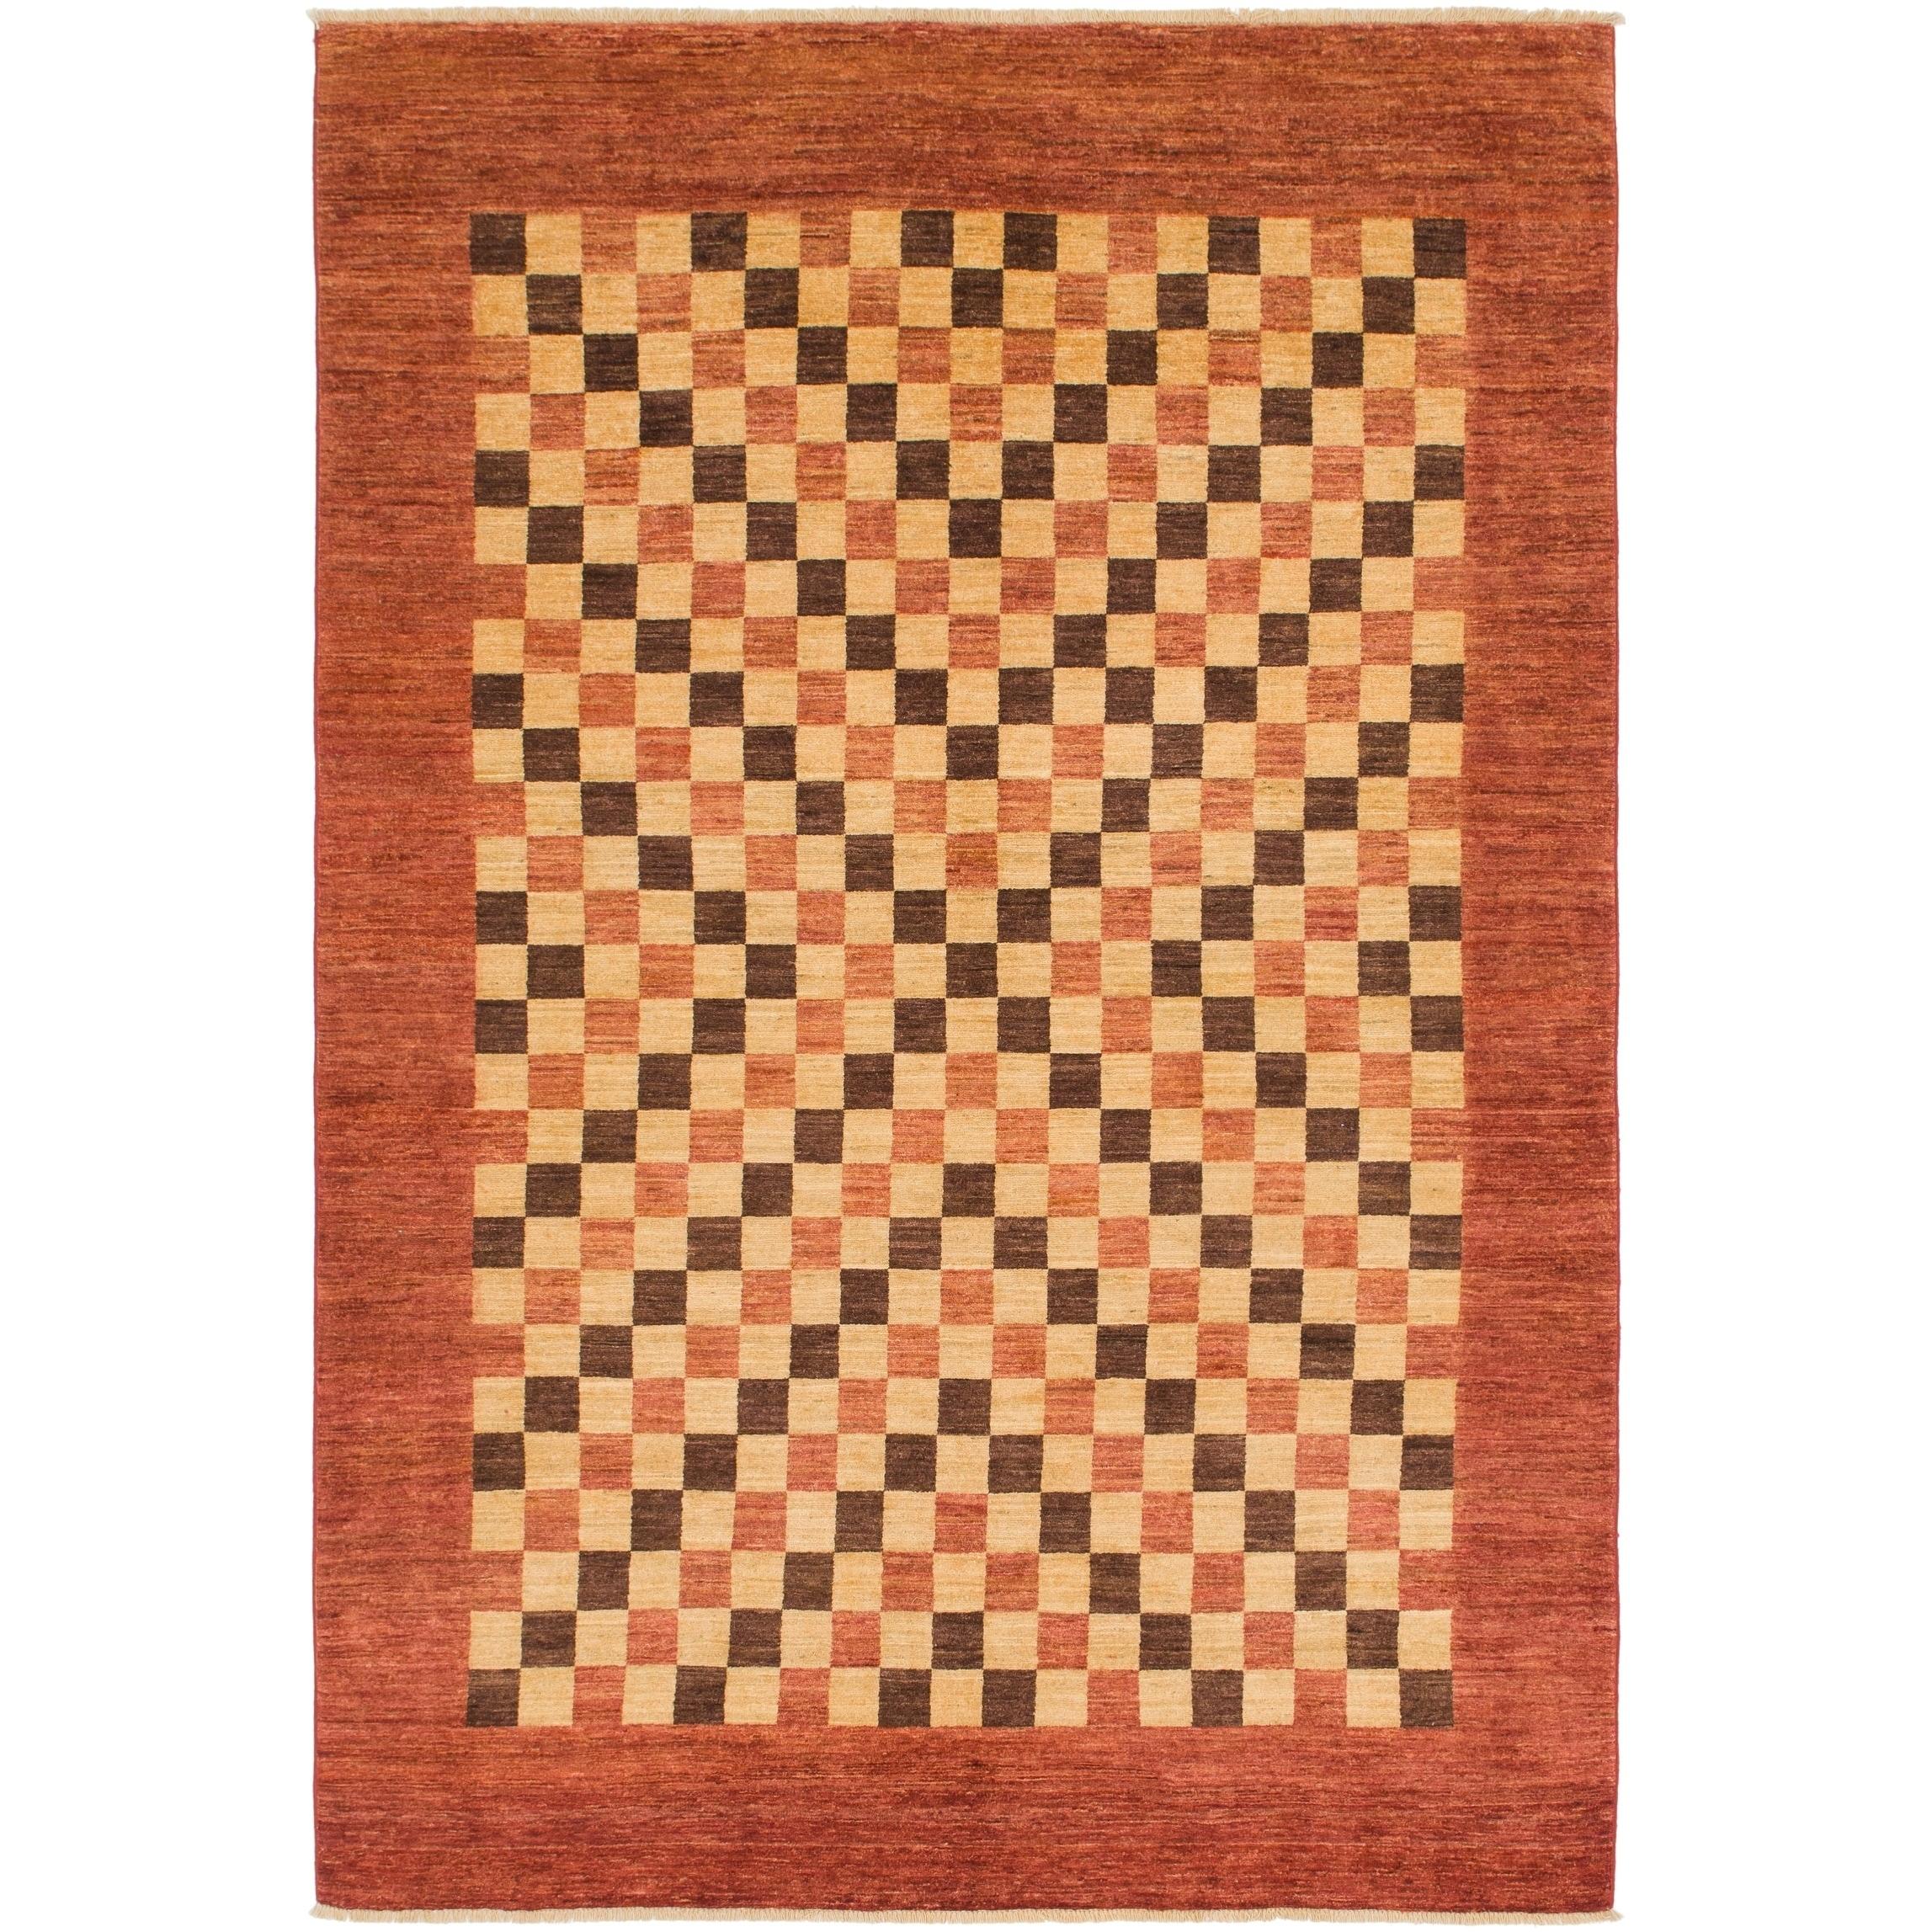 Hand Knotted Kashkuli Gabbeh Wool Area Rug - 6 8 x 9 9 (Cream - 6 8 x 9 9)